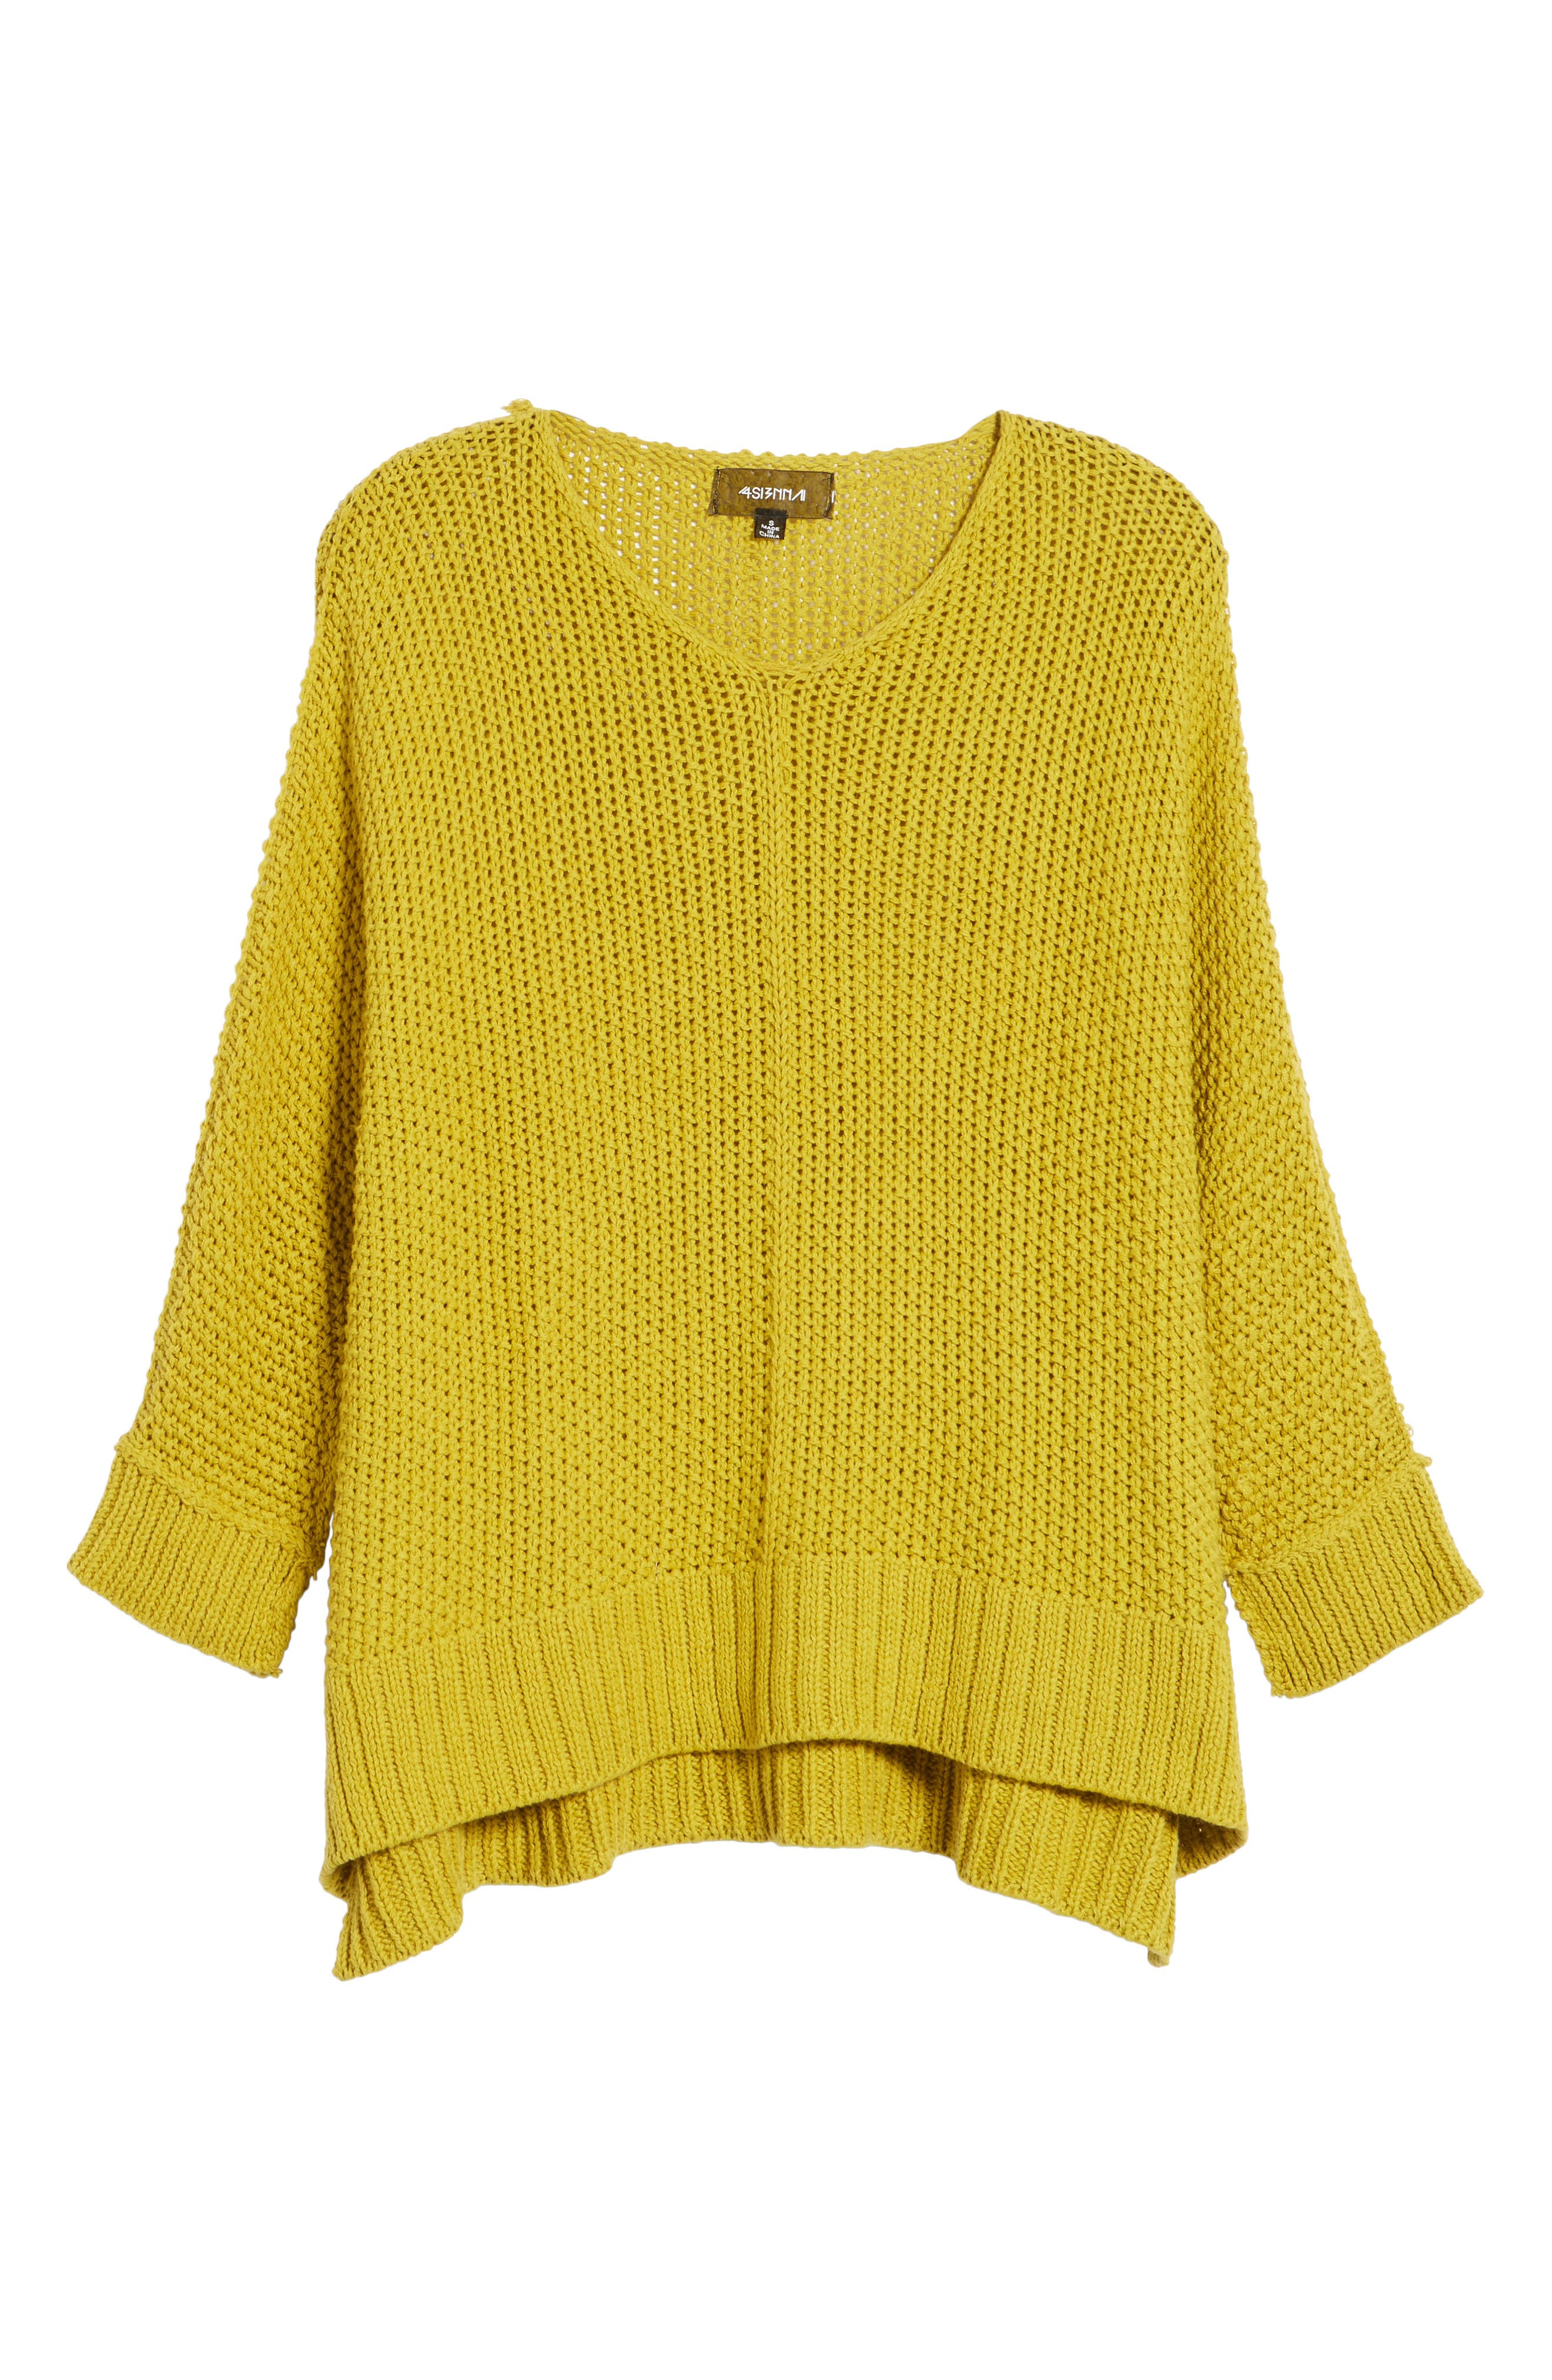 Dolman Sleeve Sweater,                             Alternate thumbnail 6, color,                             310